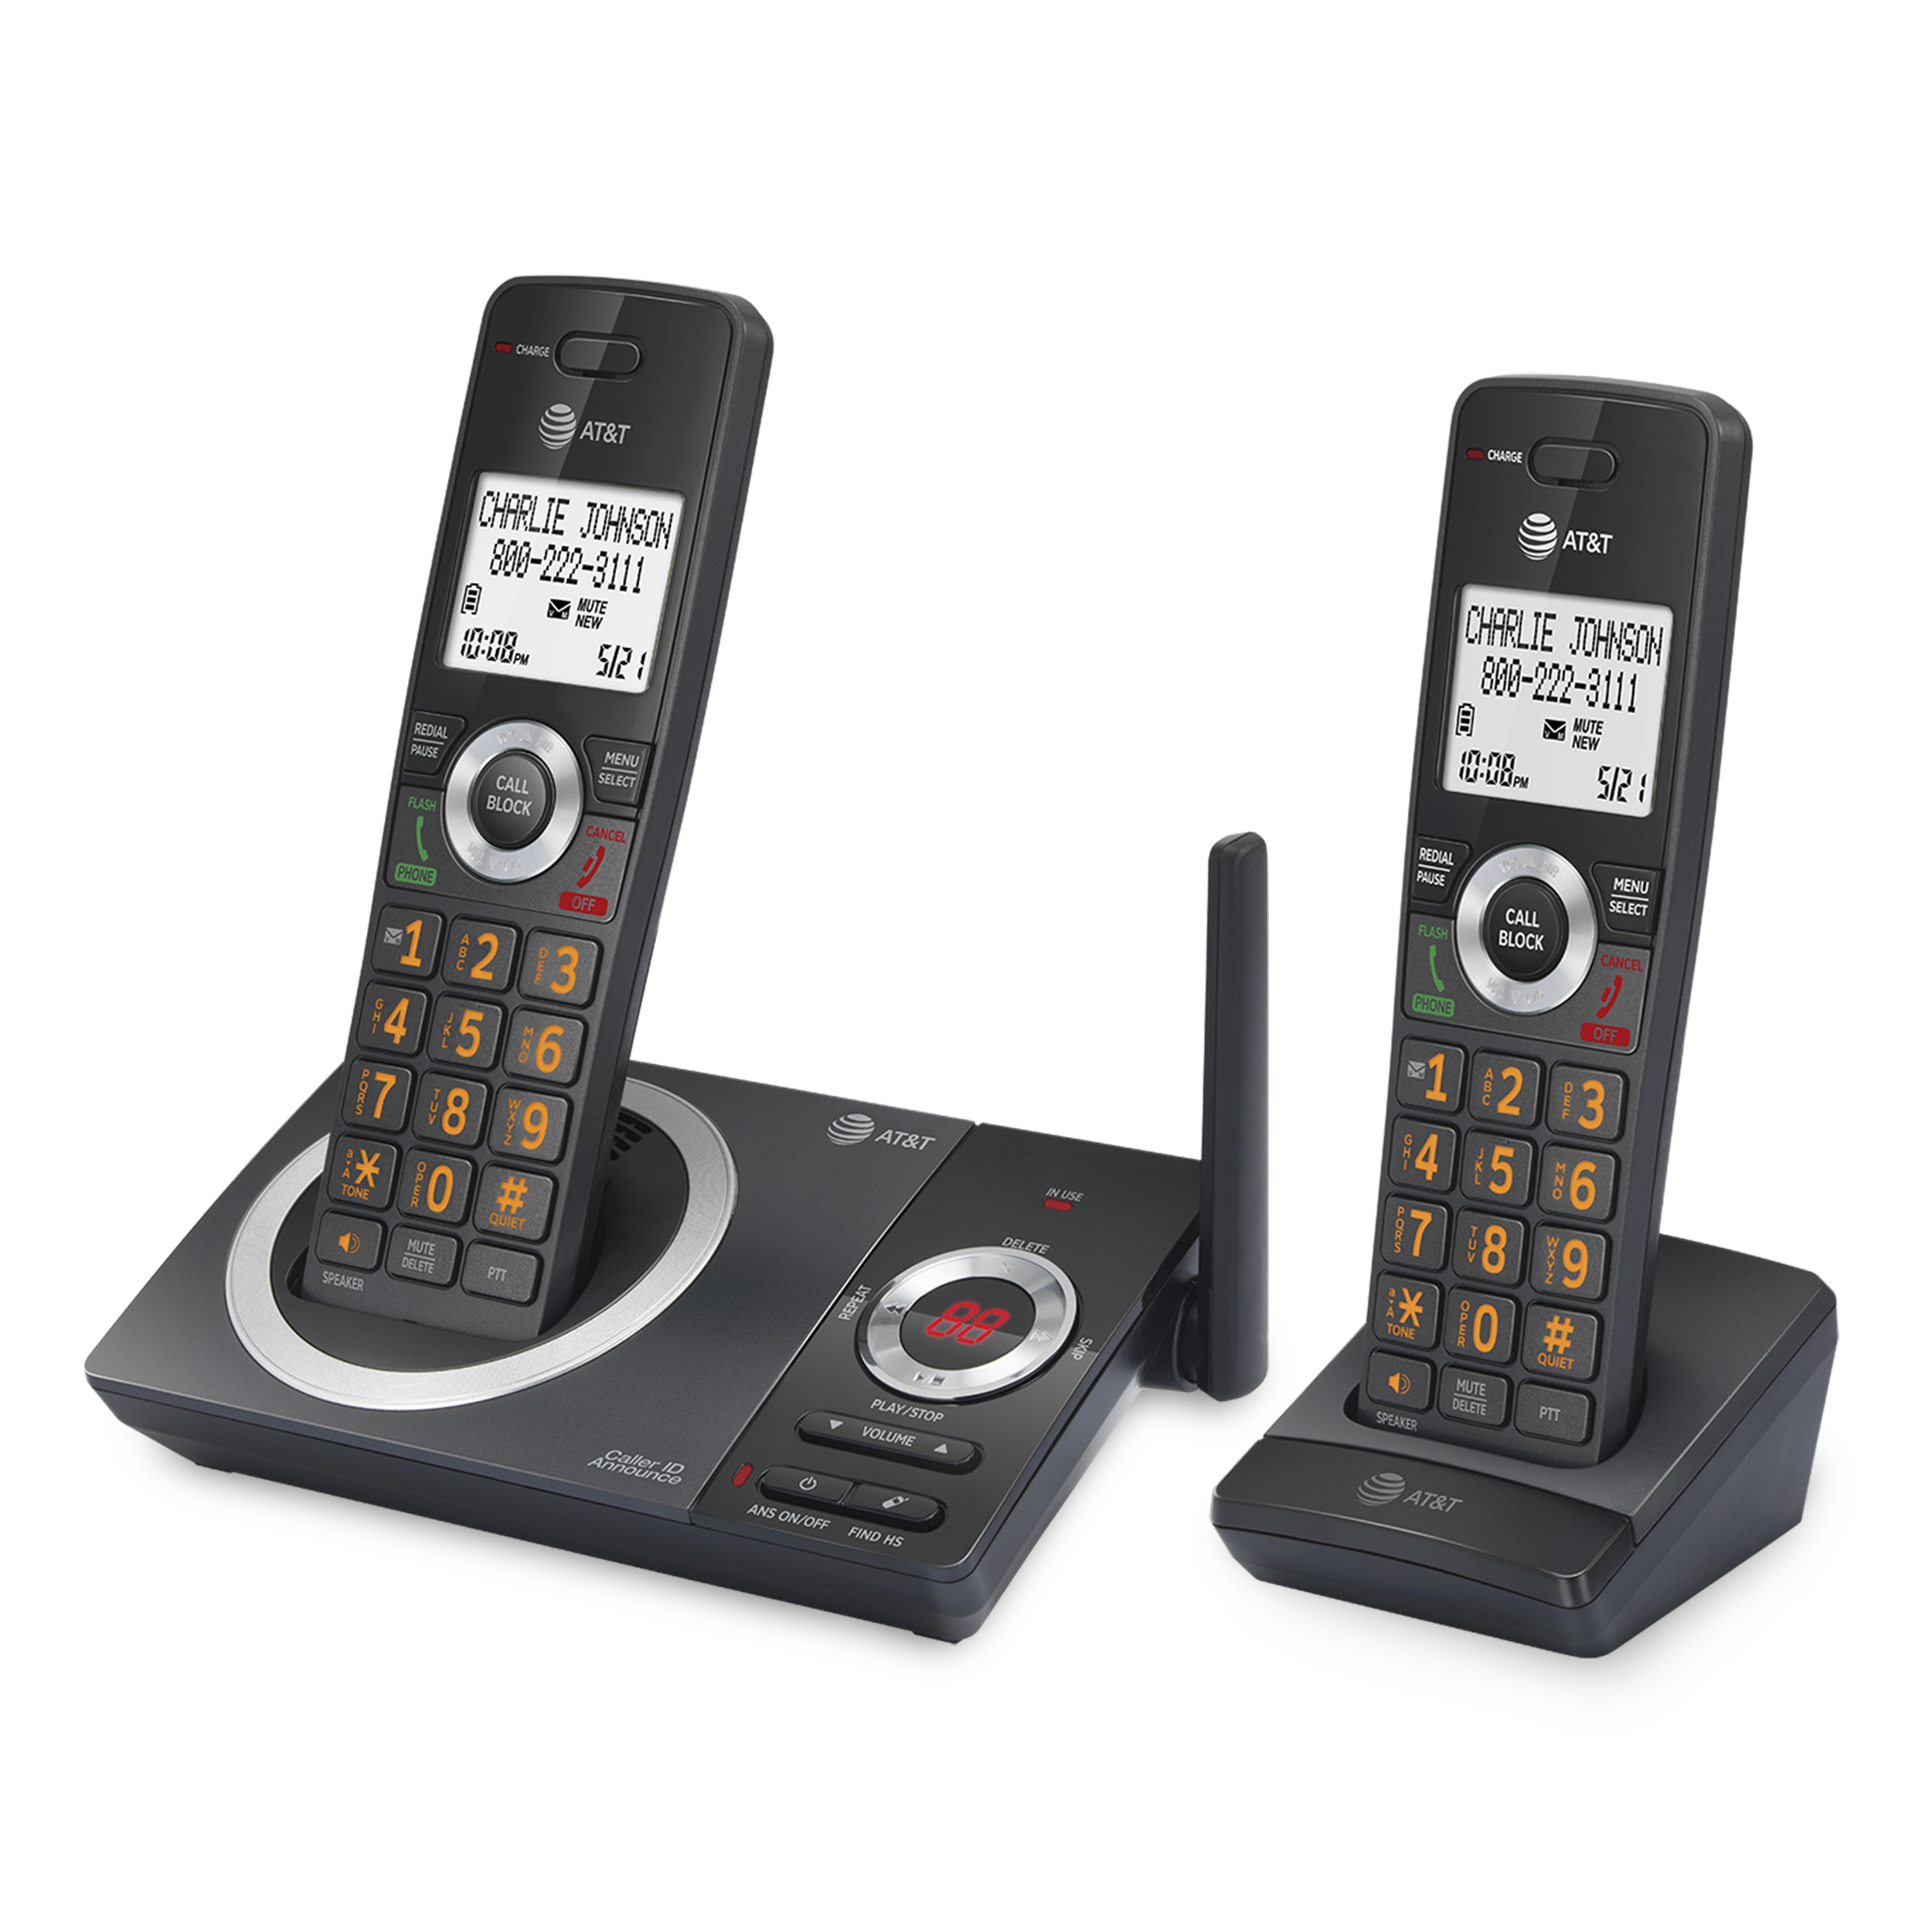 8 CRL30102 AT/&T Cordless Answering System Talking Caller ID 9 Cordless CRL32102